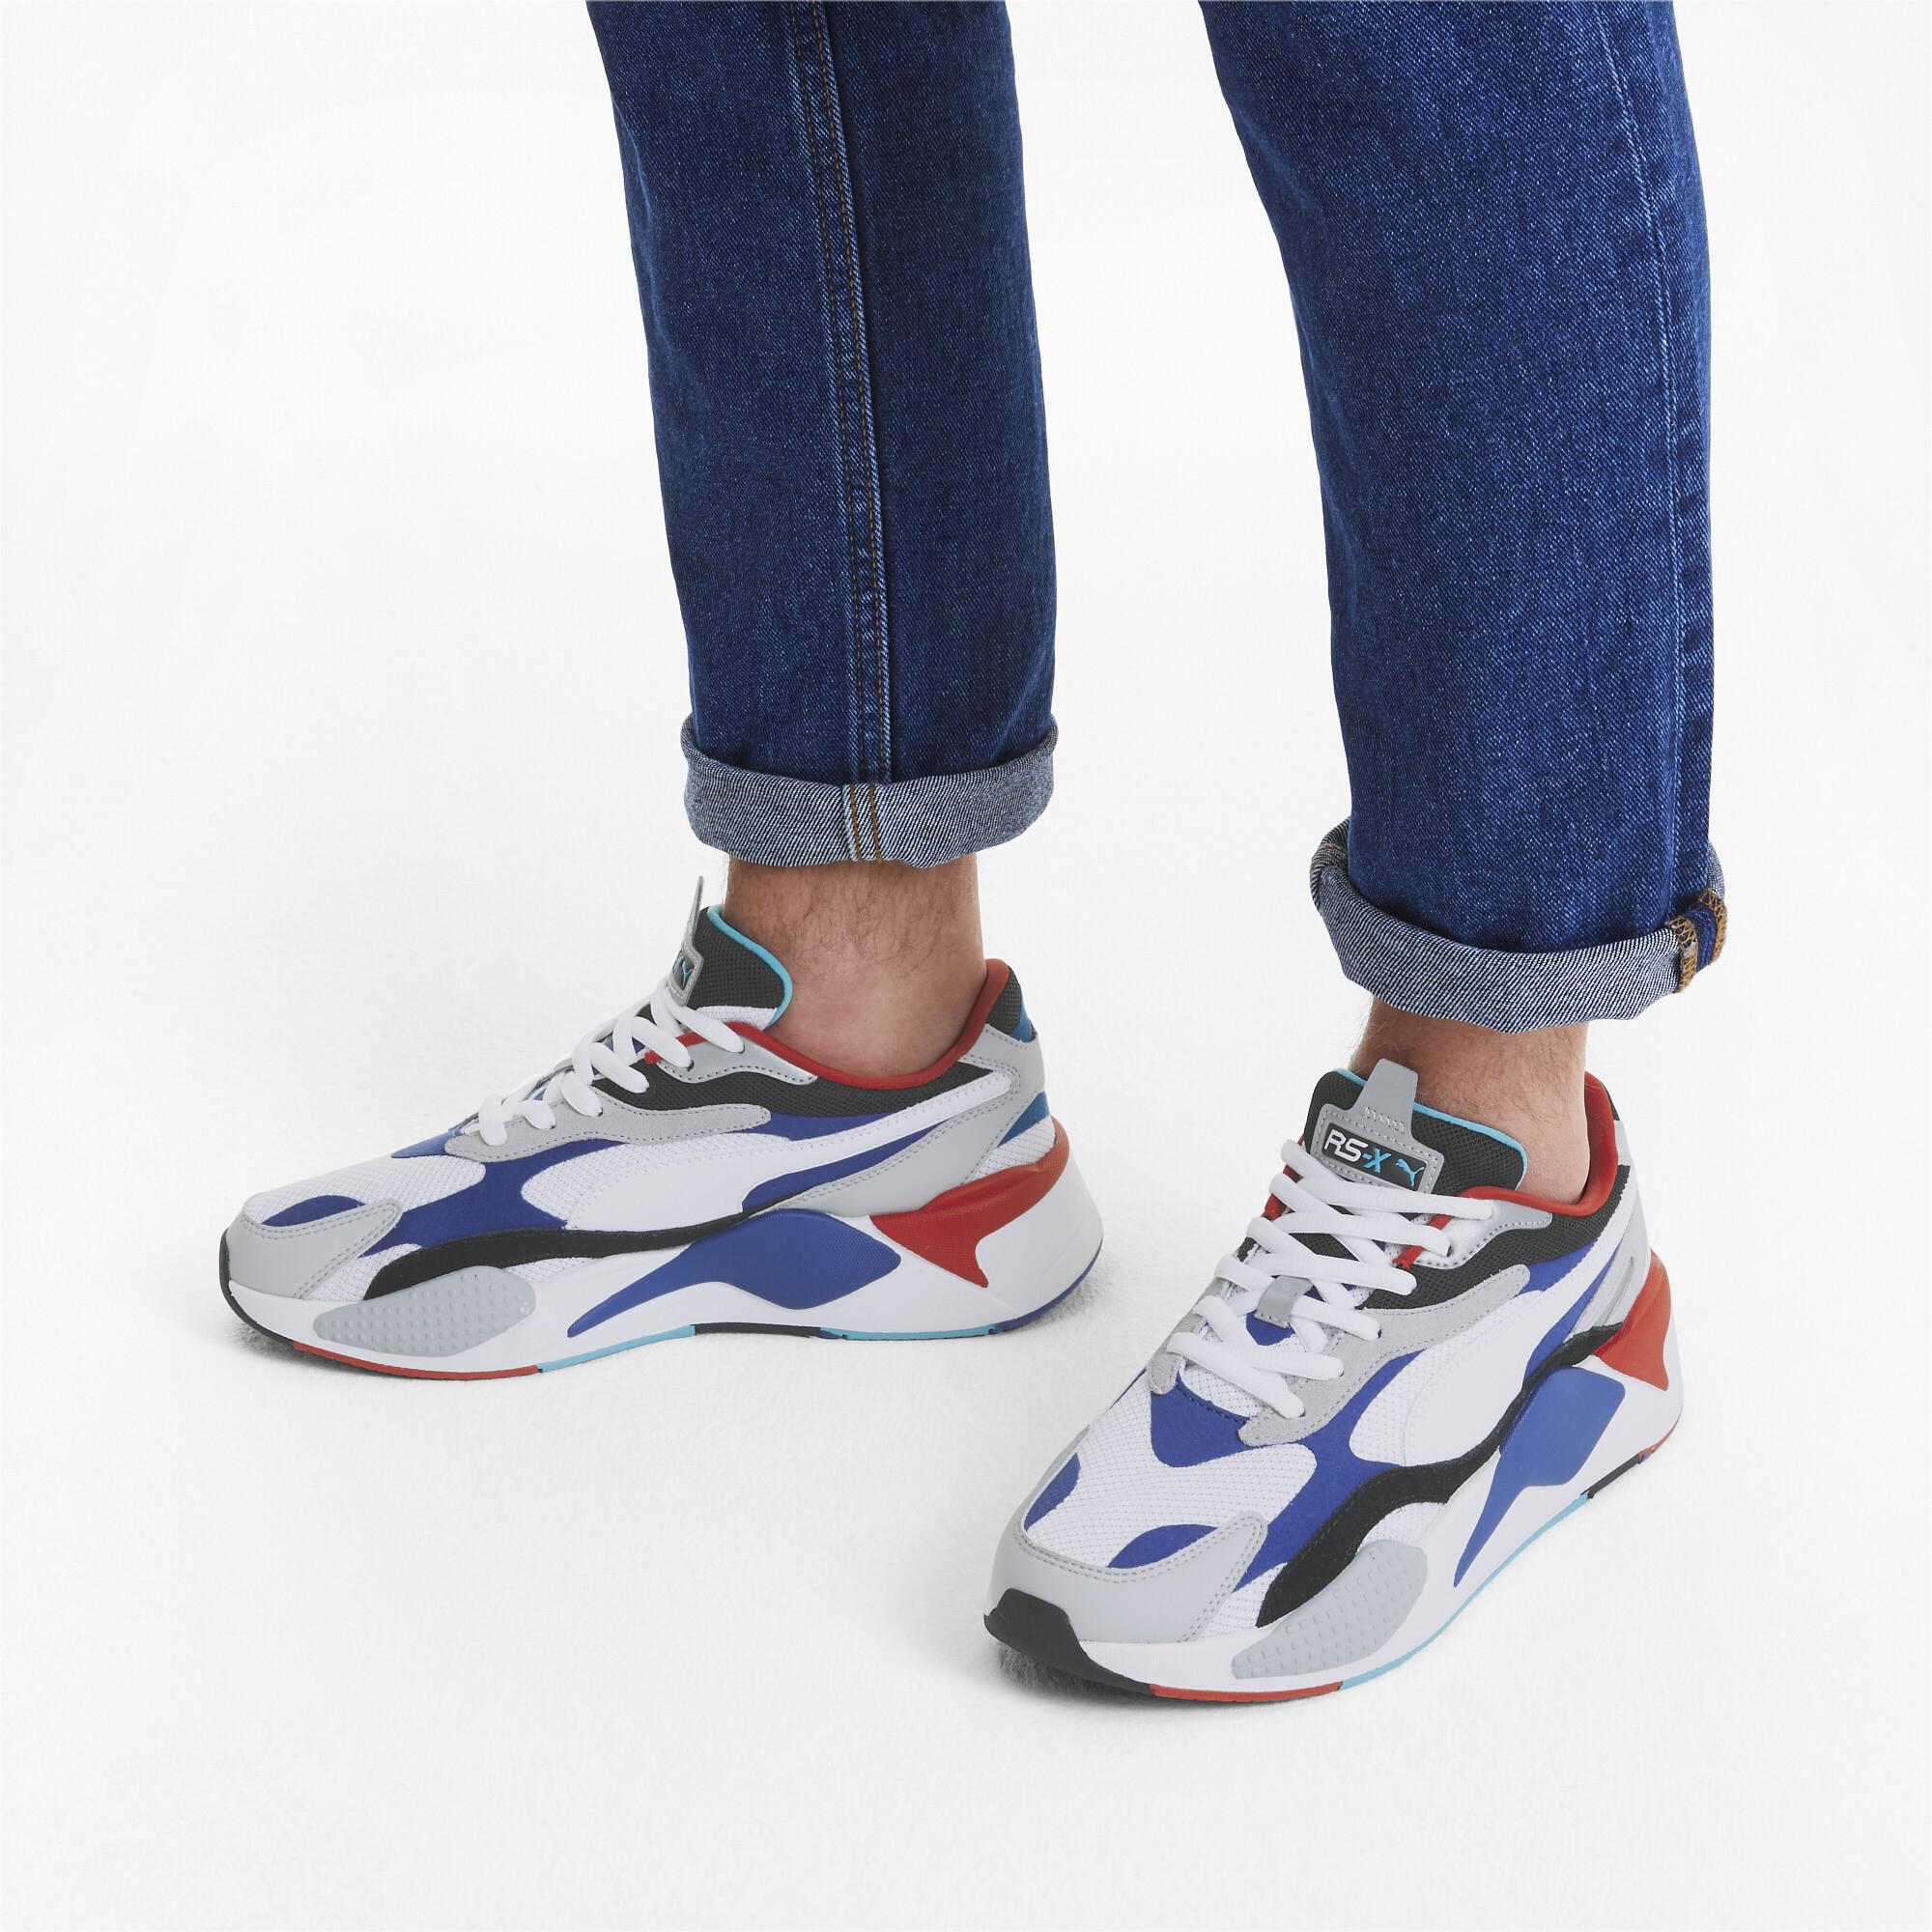 PUMA-Men-039-s-RS-X-Puzzle-Sneakers thumbnail 5